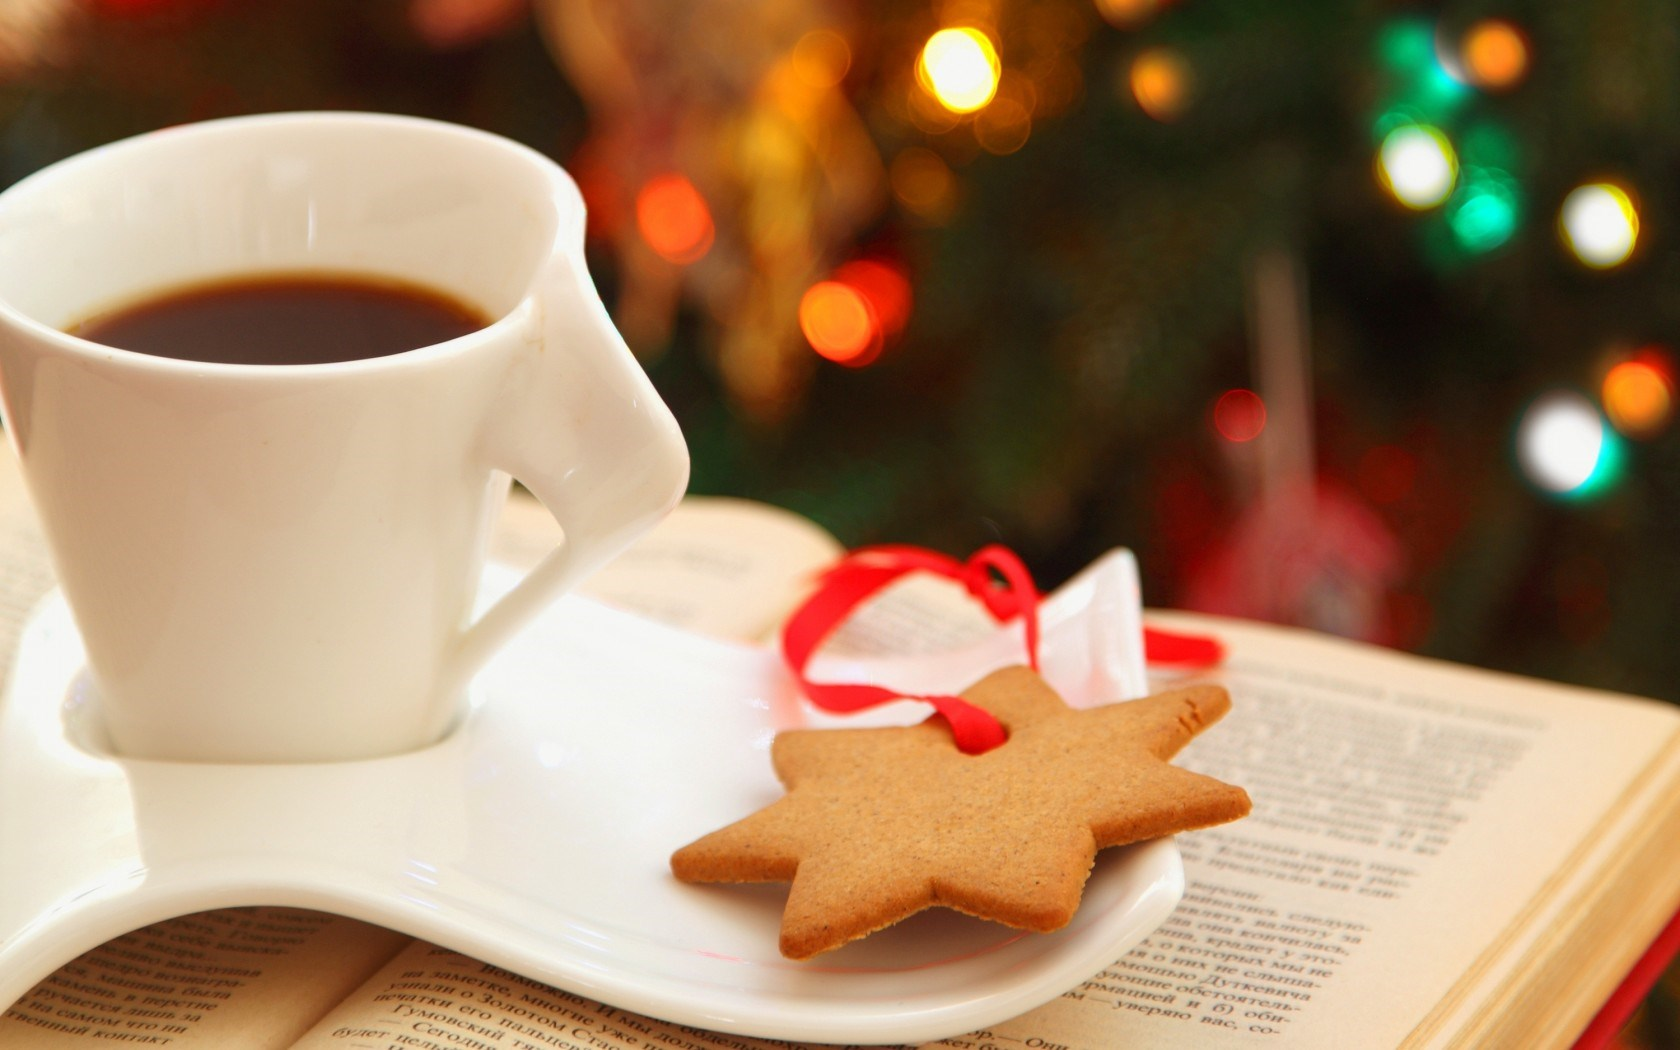 Cup Coffee Cookies Star Book Lights Bokeh Christmas